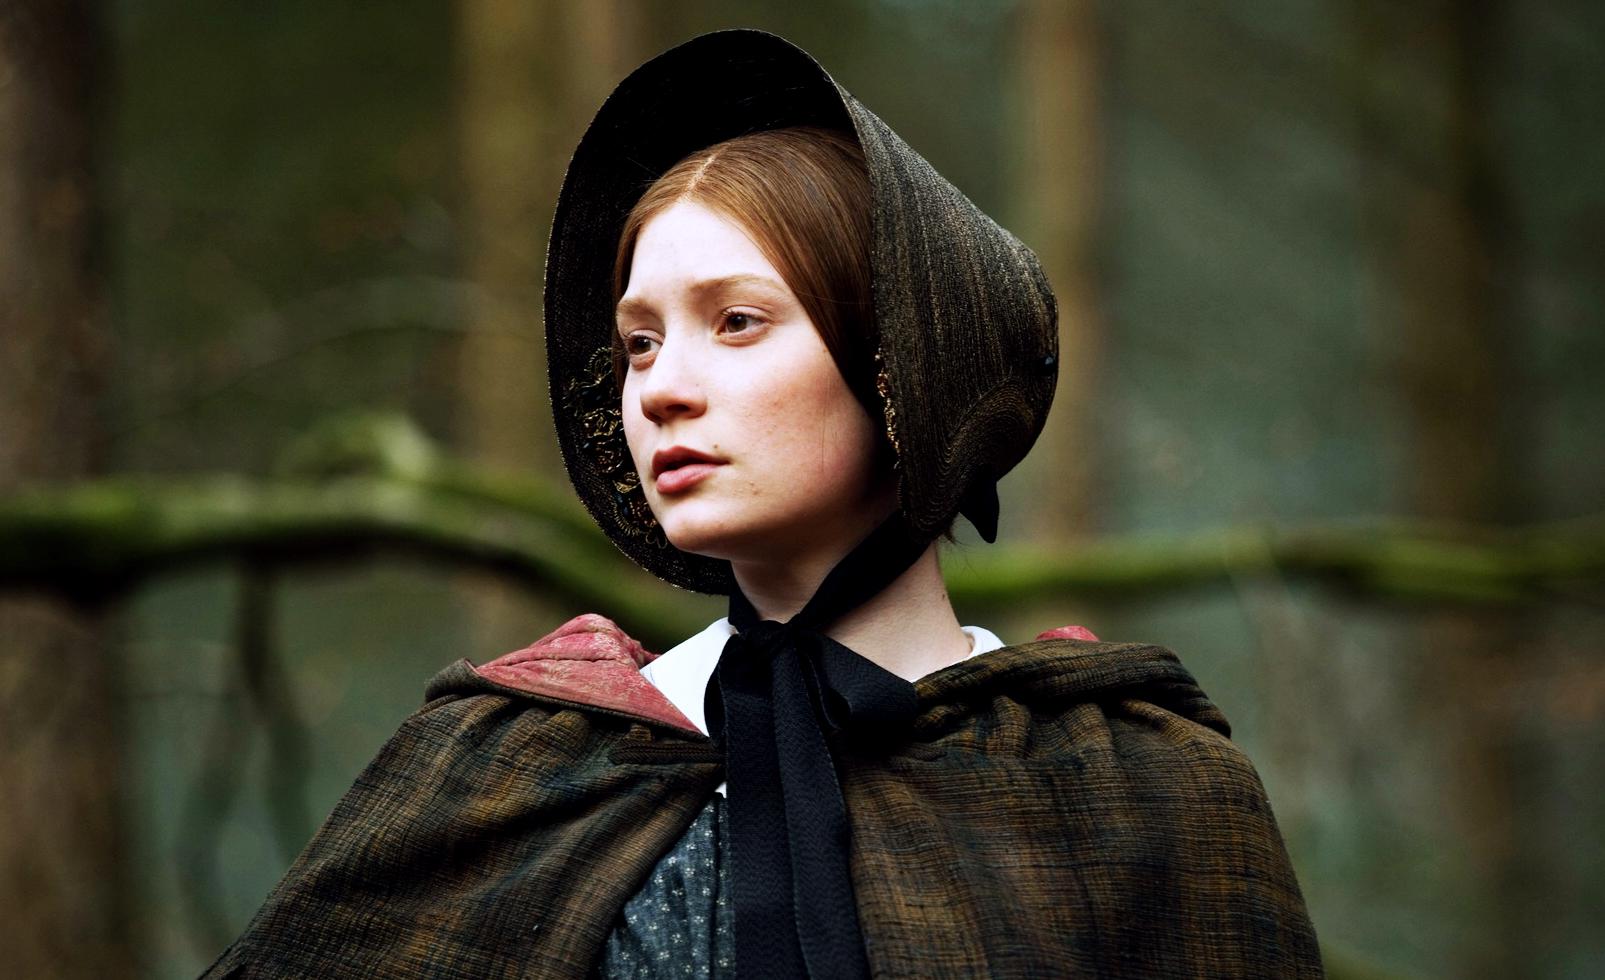 Jane-Eyre-Mia-Wasikowska